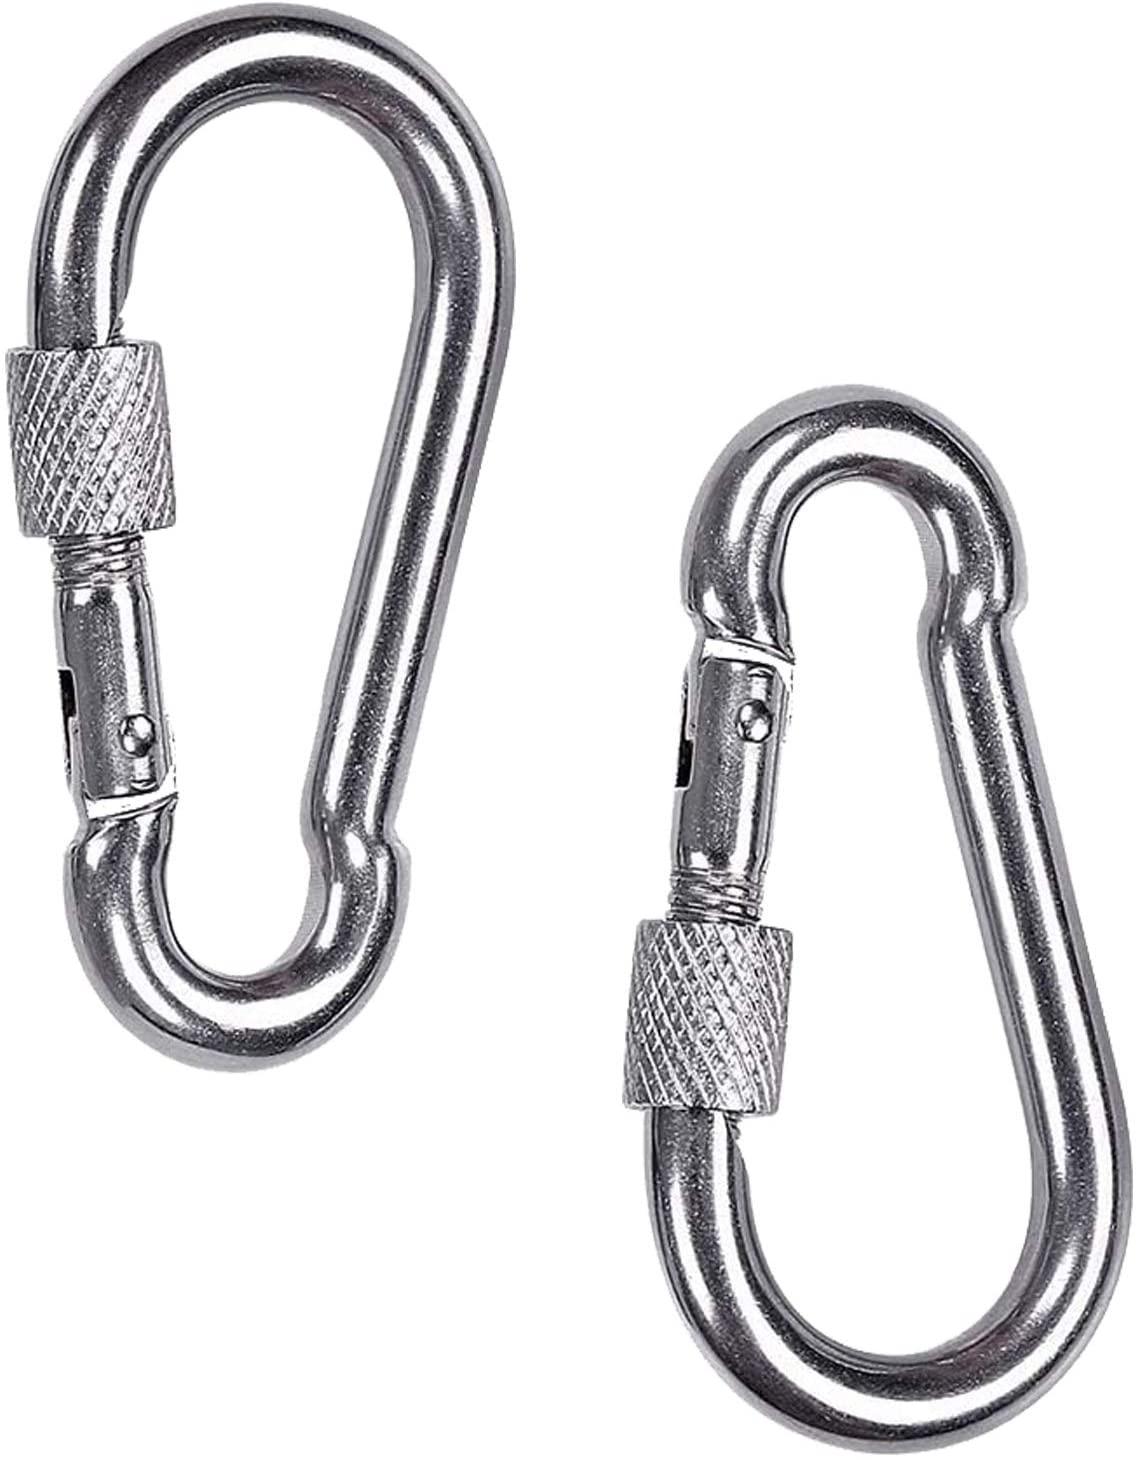 Spring Snap Hook Carabiner, Metown 304 Stainless Steel Carabiner Clips Keychain Heavy Duty Quick Link for Climbing, Swing Set, Keys, Hammock (3.15in-2Pcs)